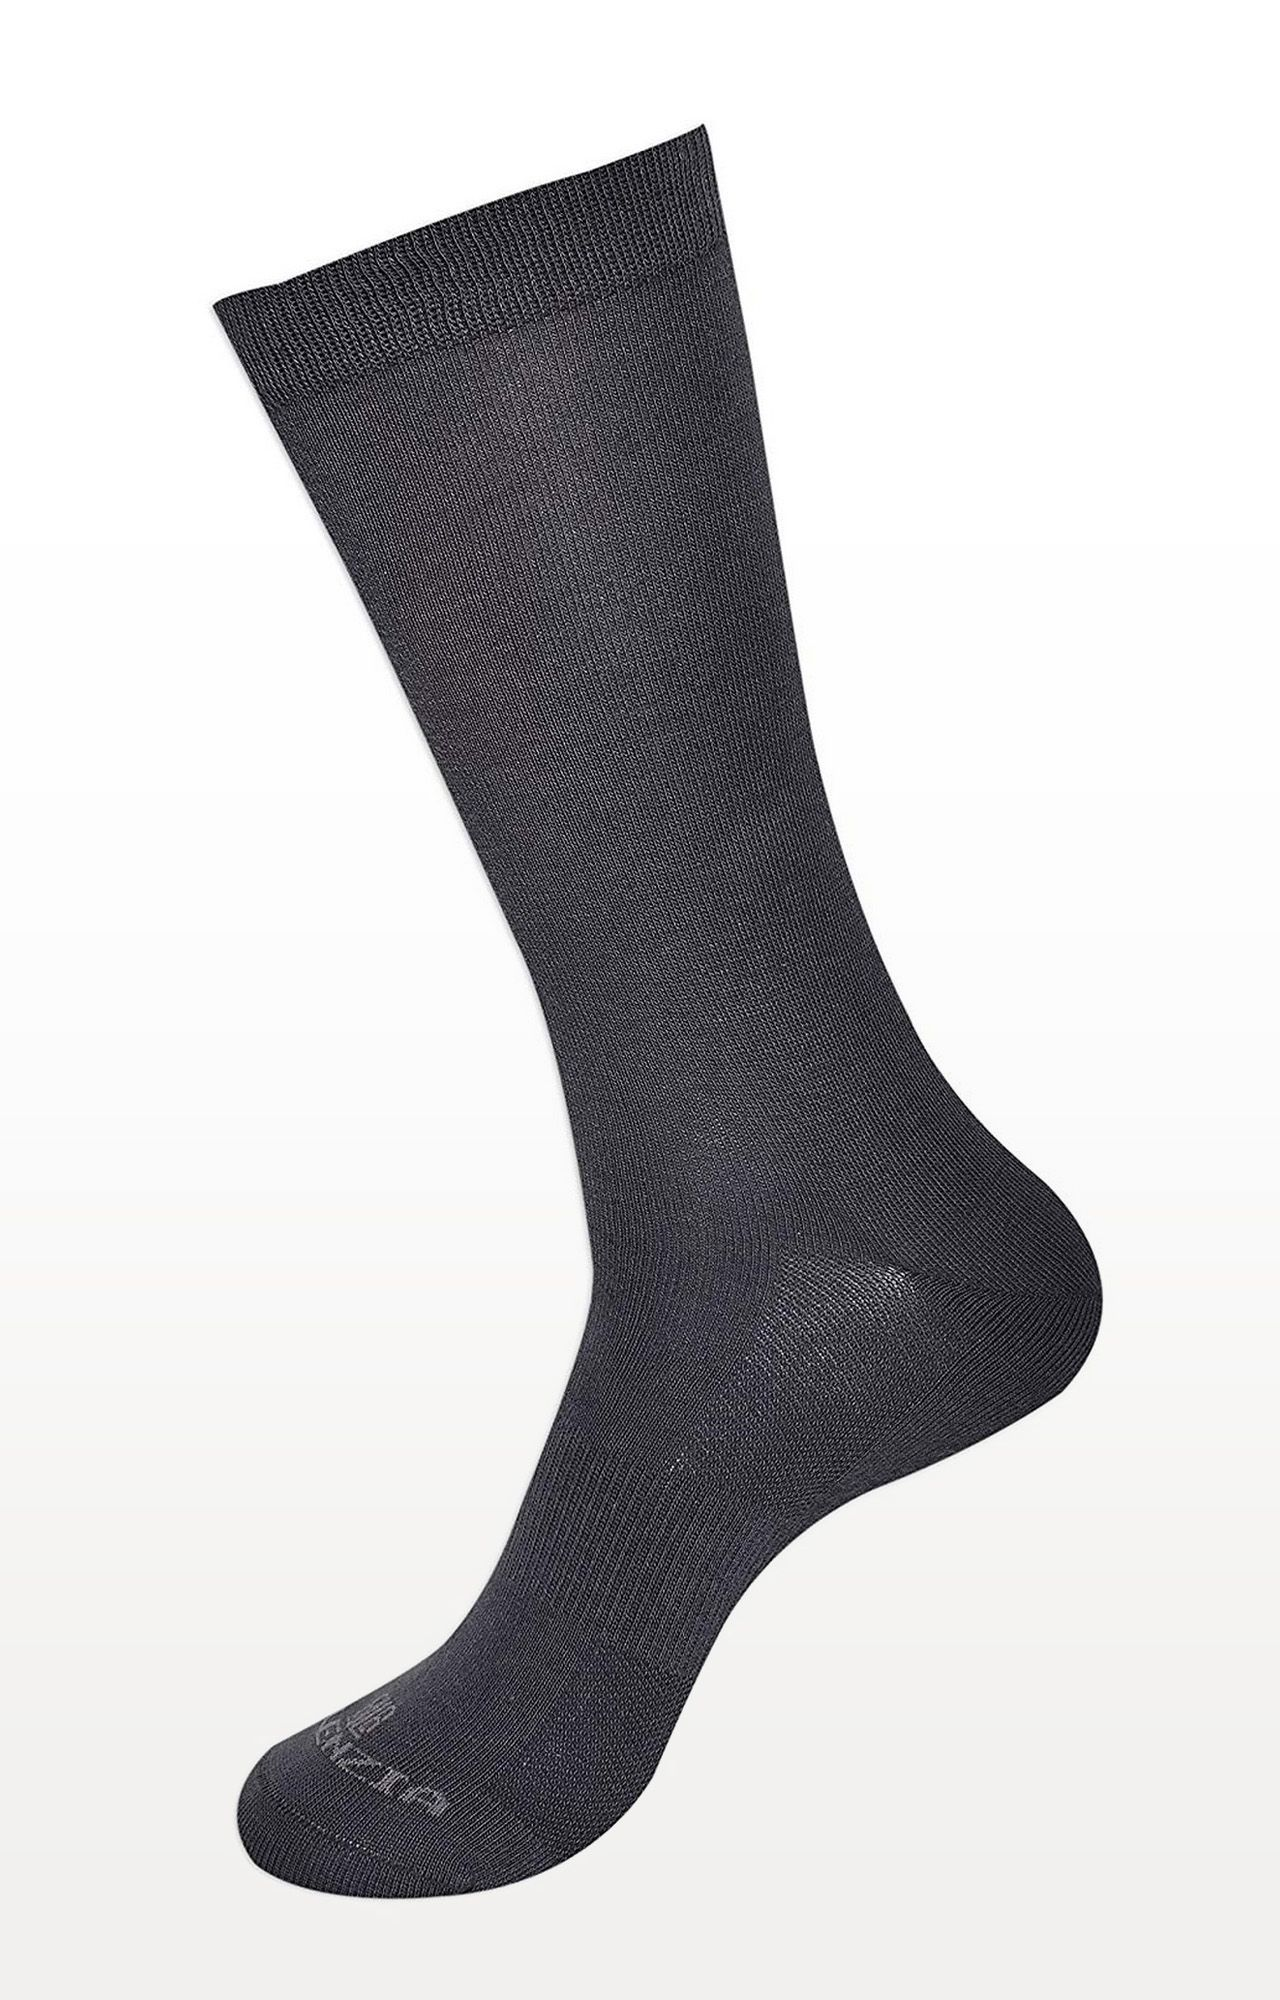 BALENZIA | Grey Solid Socks - Pack of 2